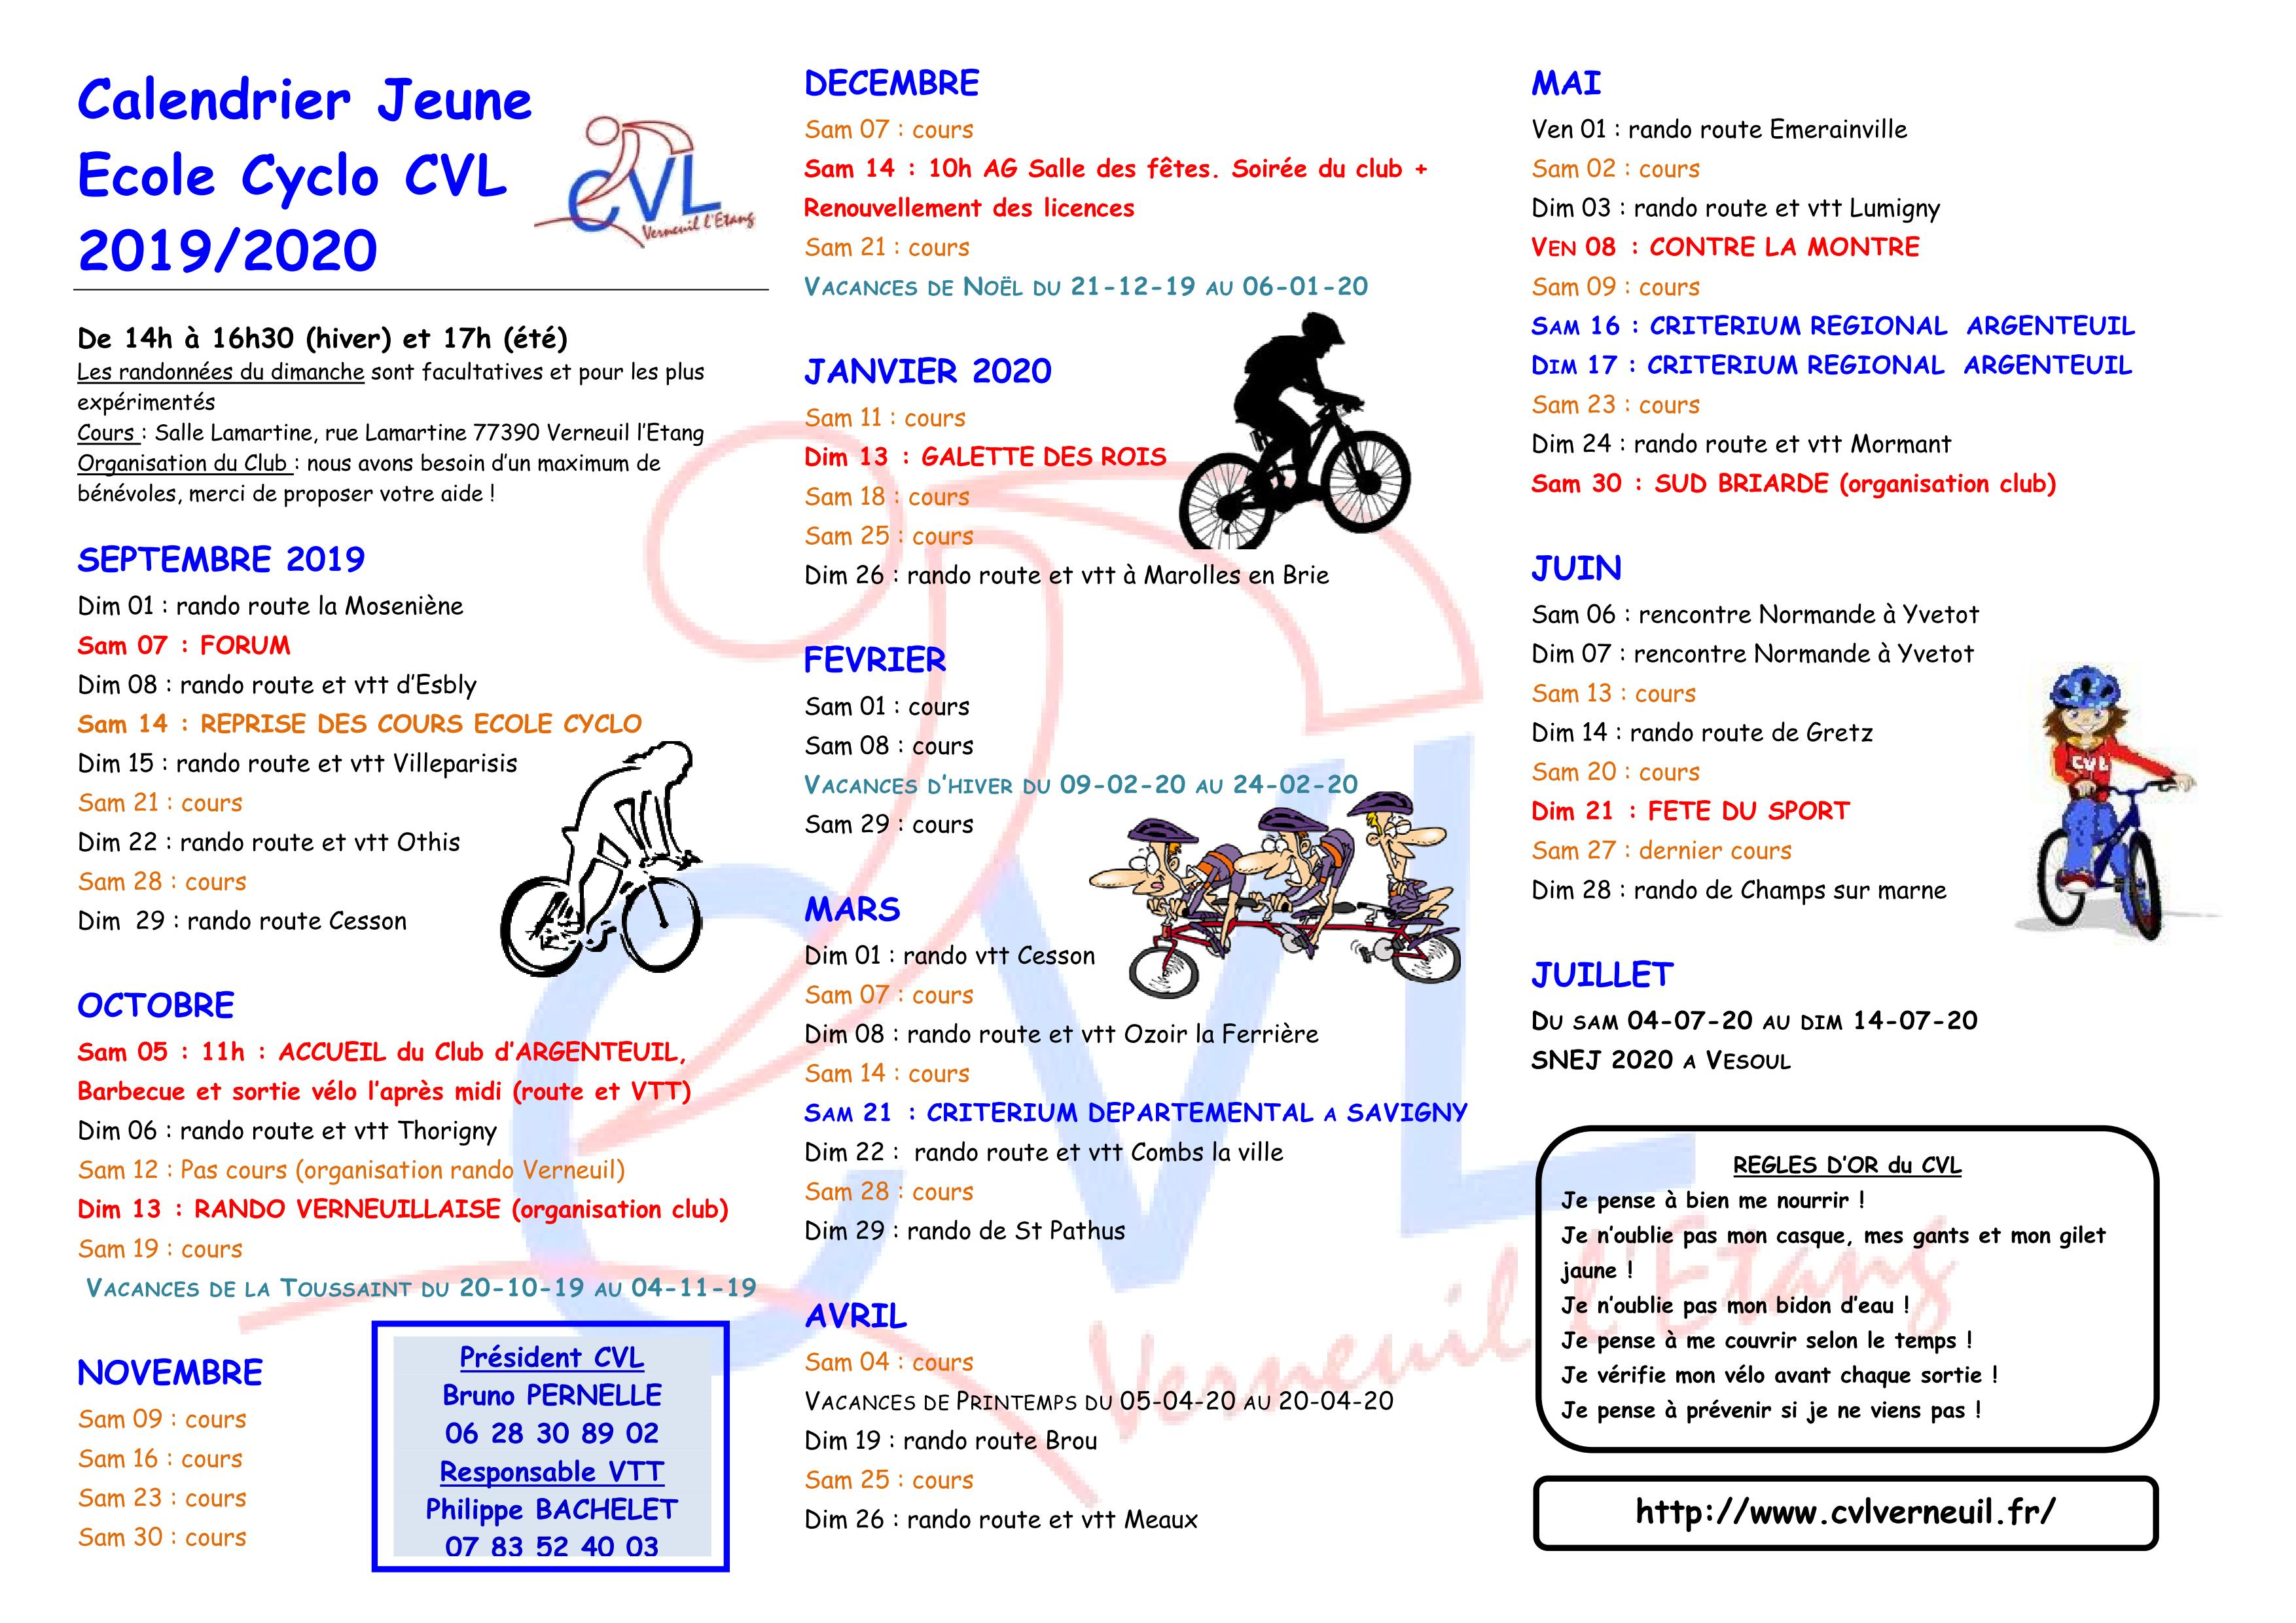 Calendrier Cyclo 2020.Calendrier Jeune 2019 2020